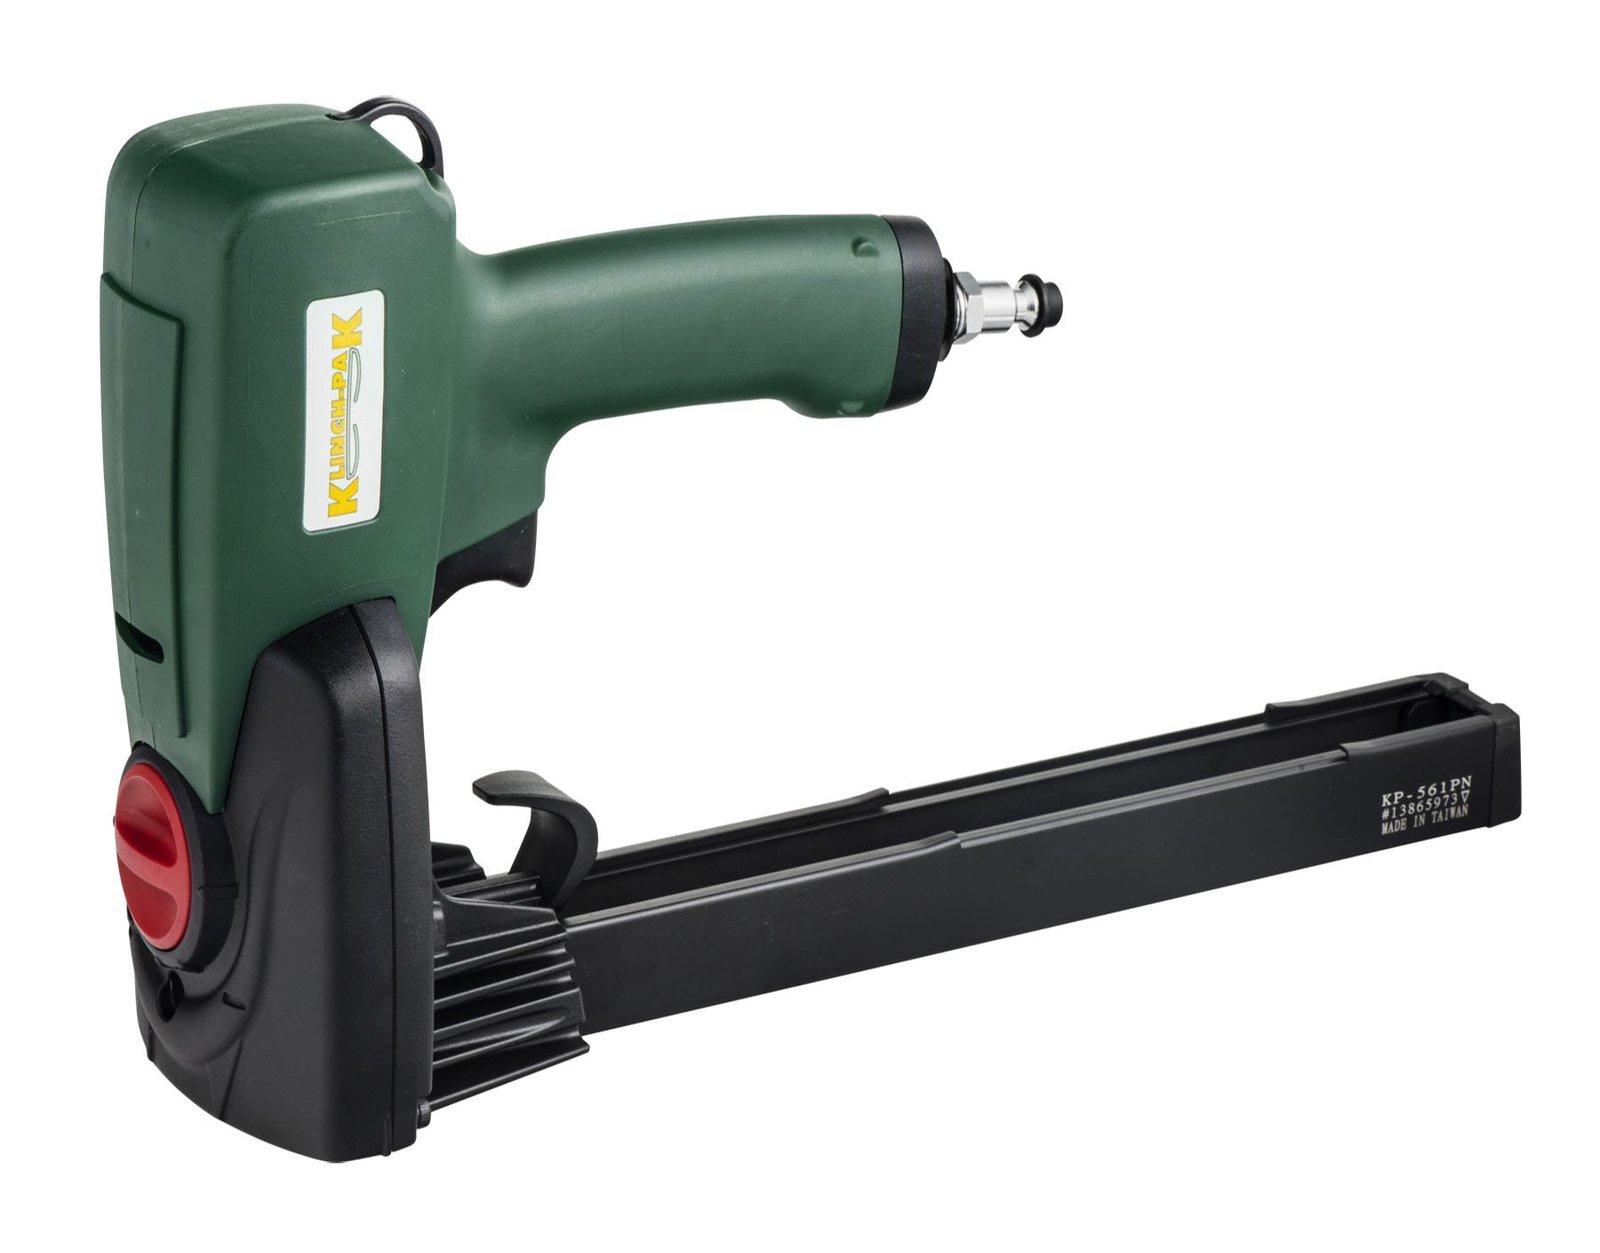 Klinch-Pak P50-10B-A Pneumatic Plier Stapler for Bostitch Style SB103020 Staples 3//8-Inch 1//2-Inch or 5//8-Inch